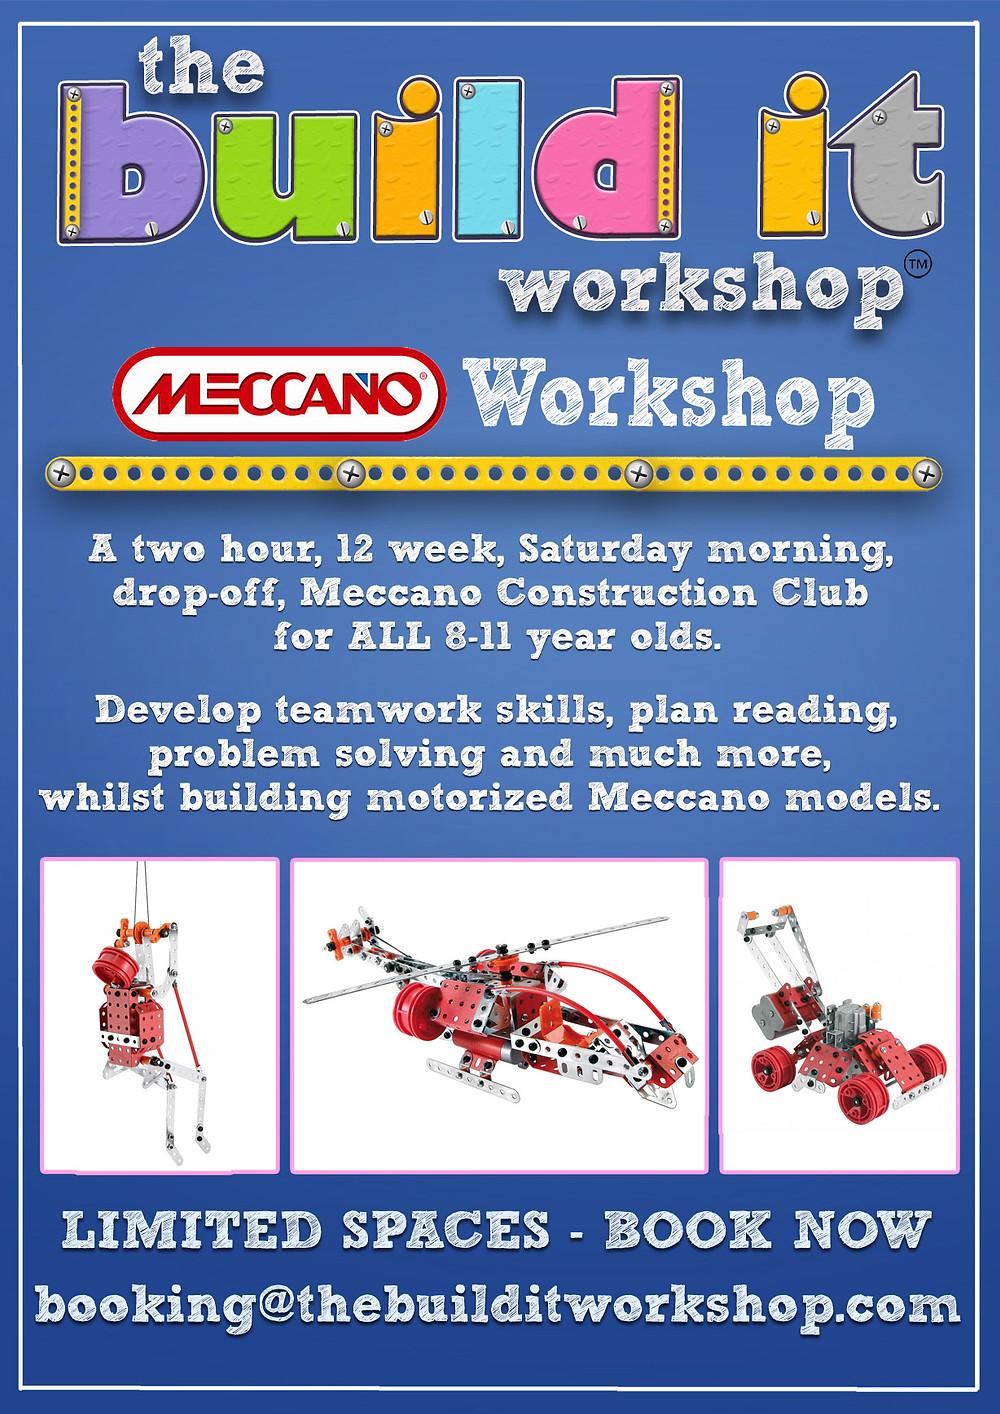 the build it workshop - Meccano Club.jpg